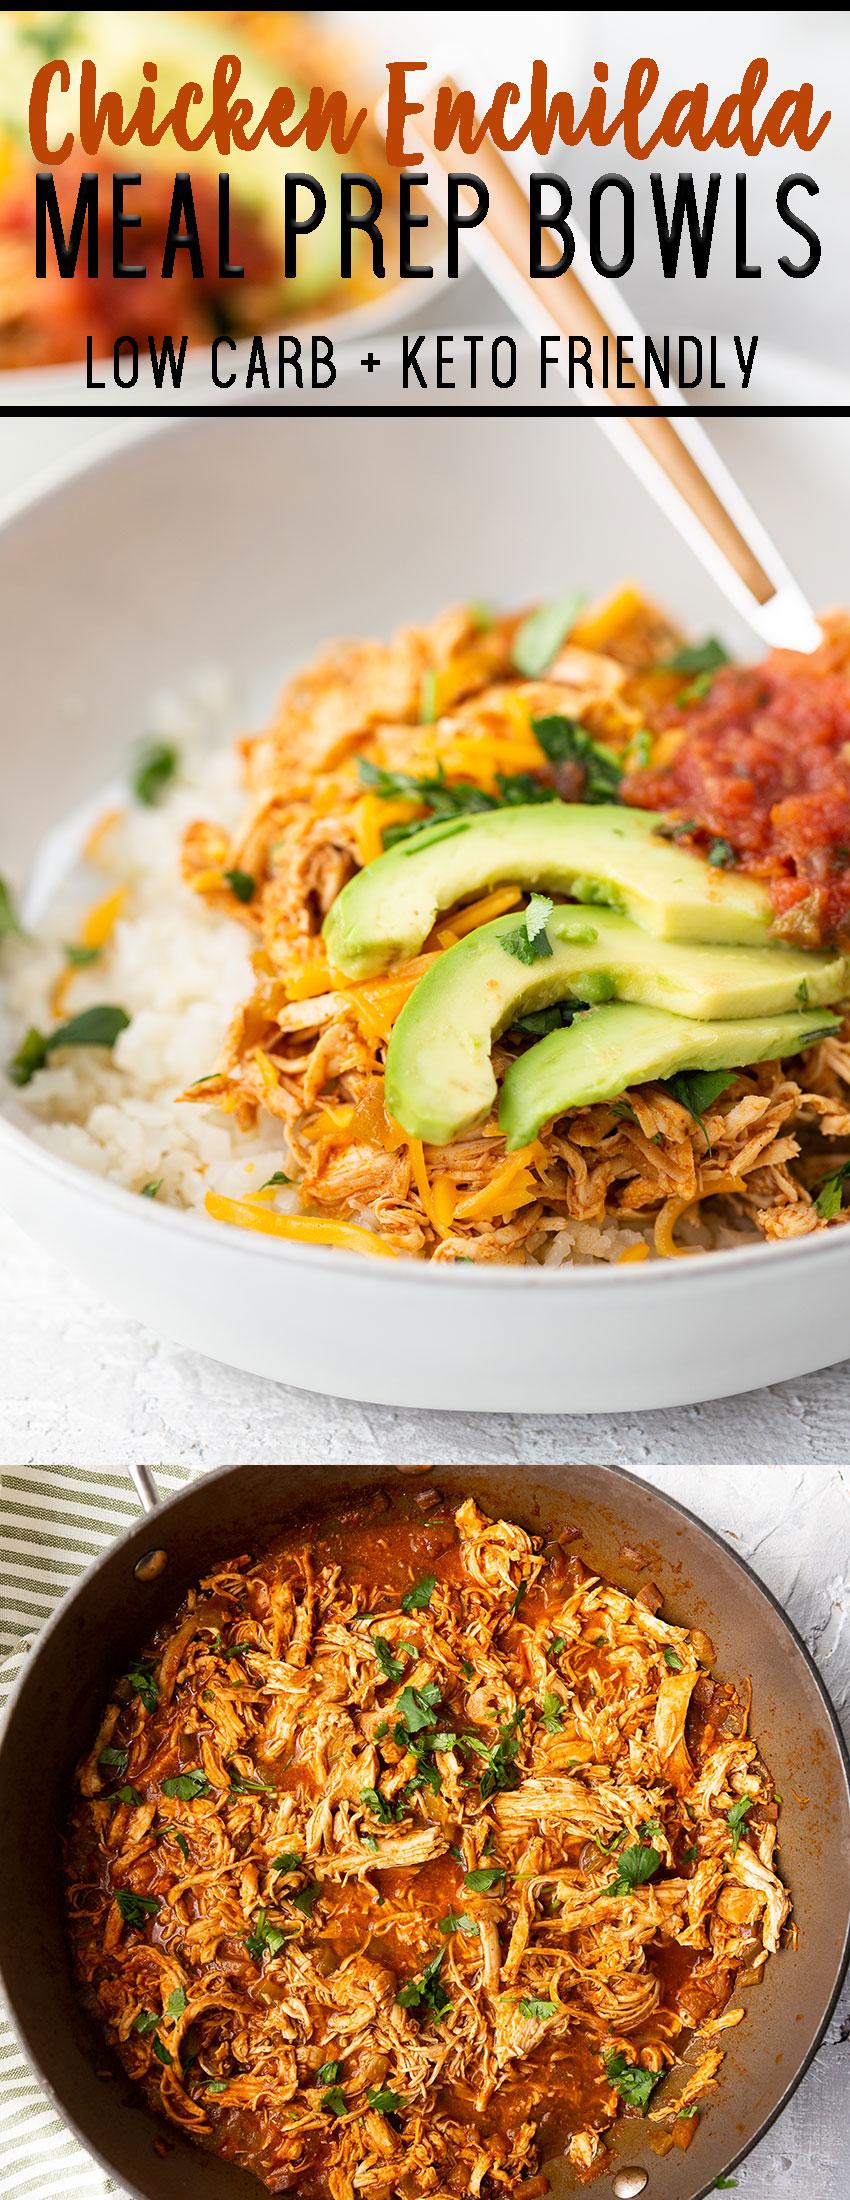 Chicken enchilada bowls--A keto friendly, low carb meal option for chicken enchiladas